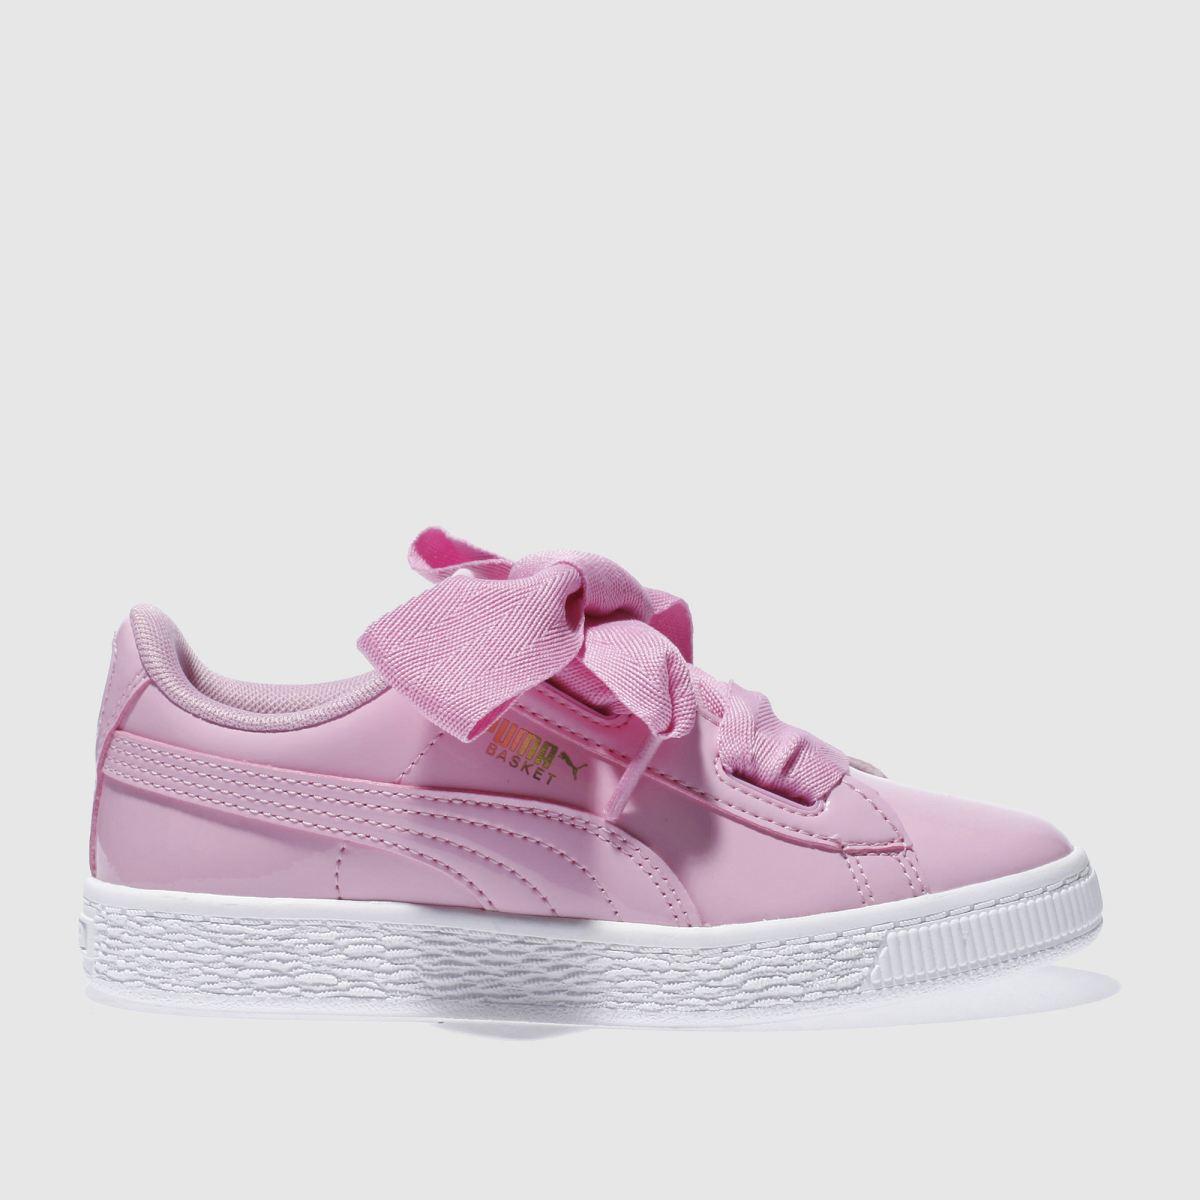 puma pink basket heart patent Girls Junior Trainers